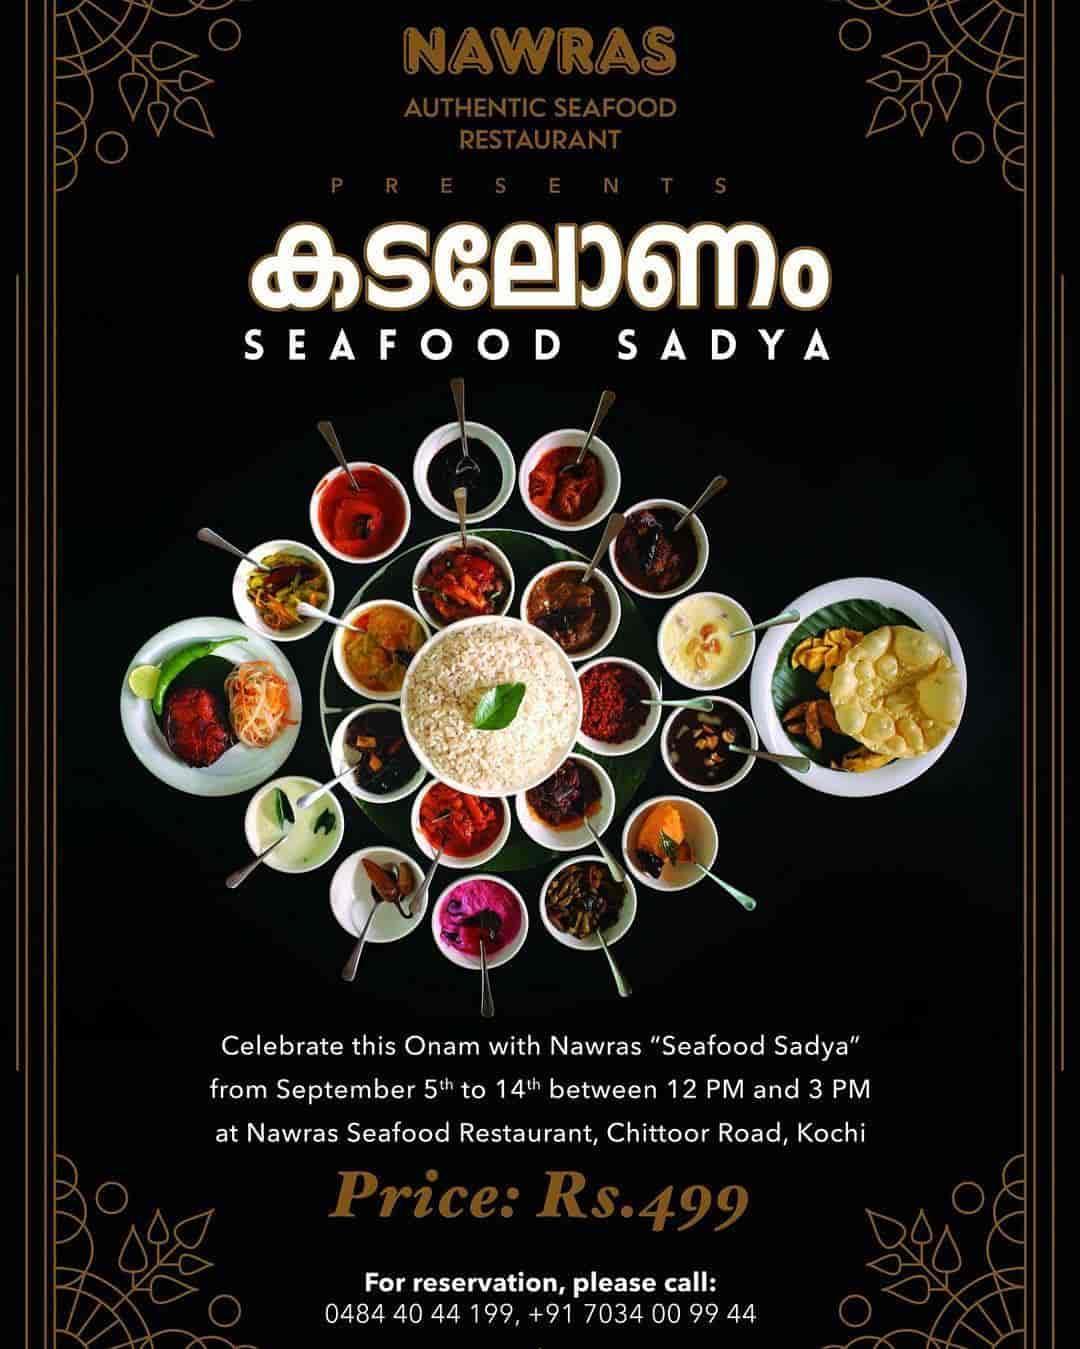 Nawras Authentic Seafood Restaurant, Ernakulam College